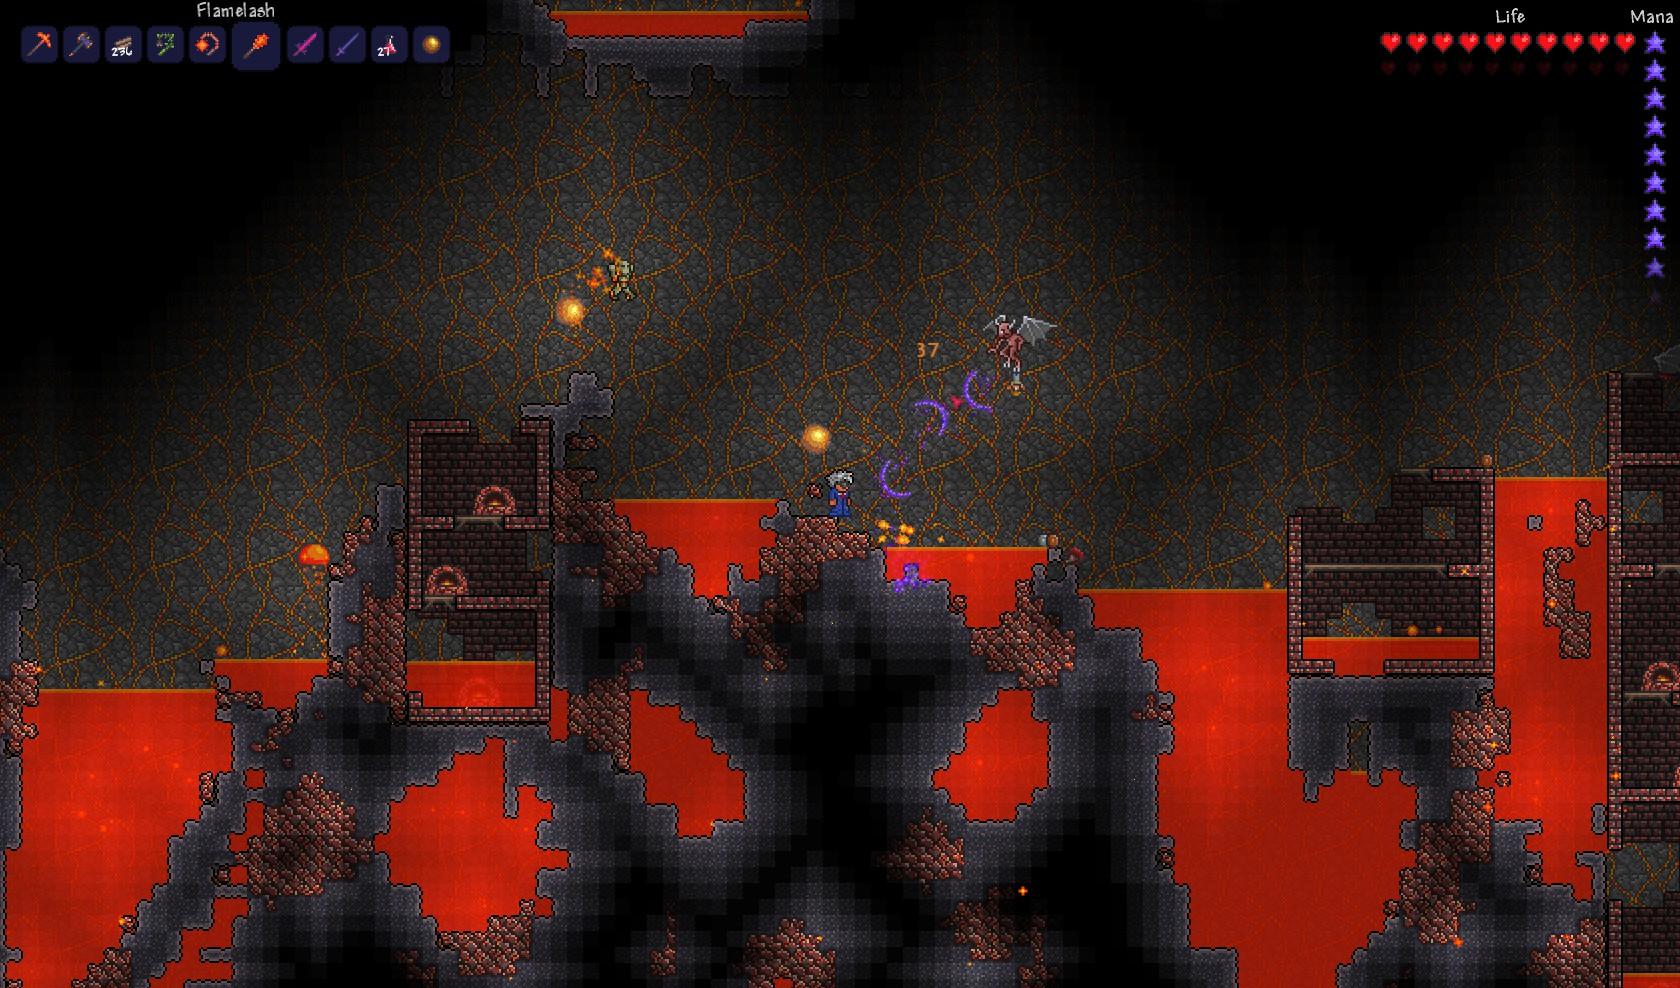 Image terraria environment underworldg terraria wiki fandom terraria environment underworldg gumiabroncs Images